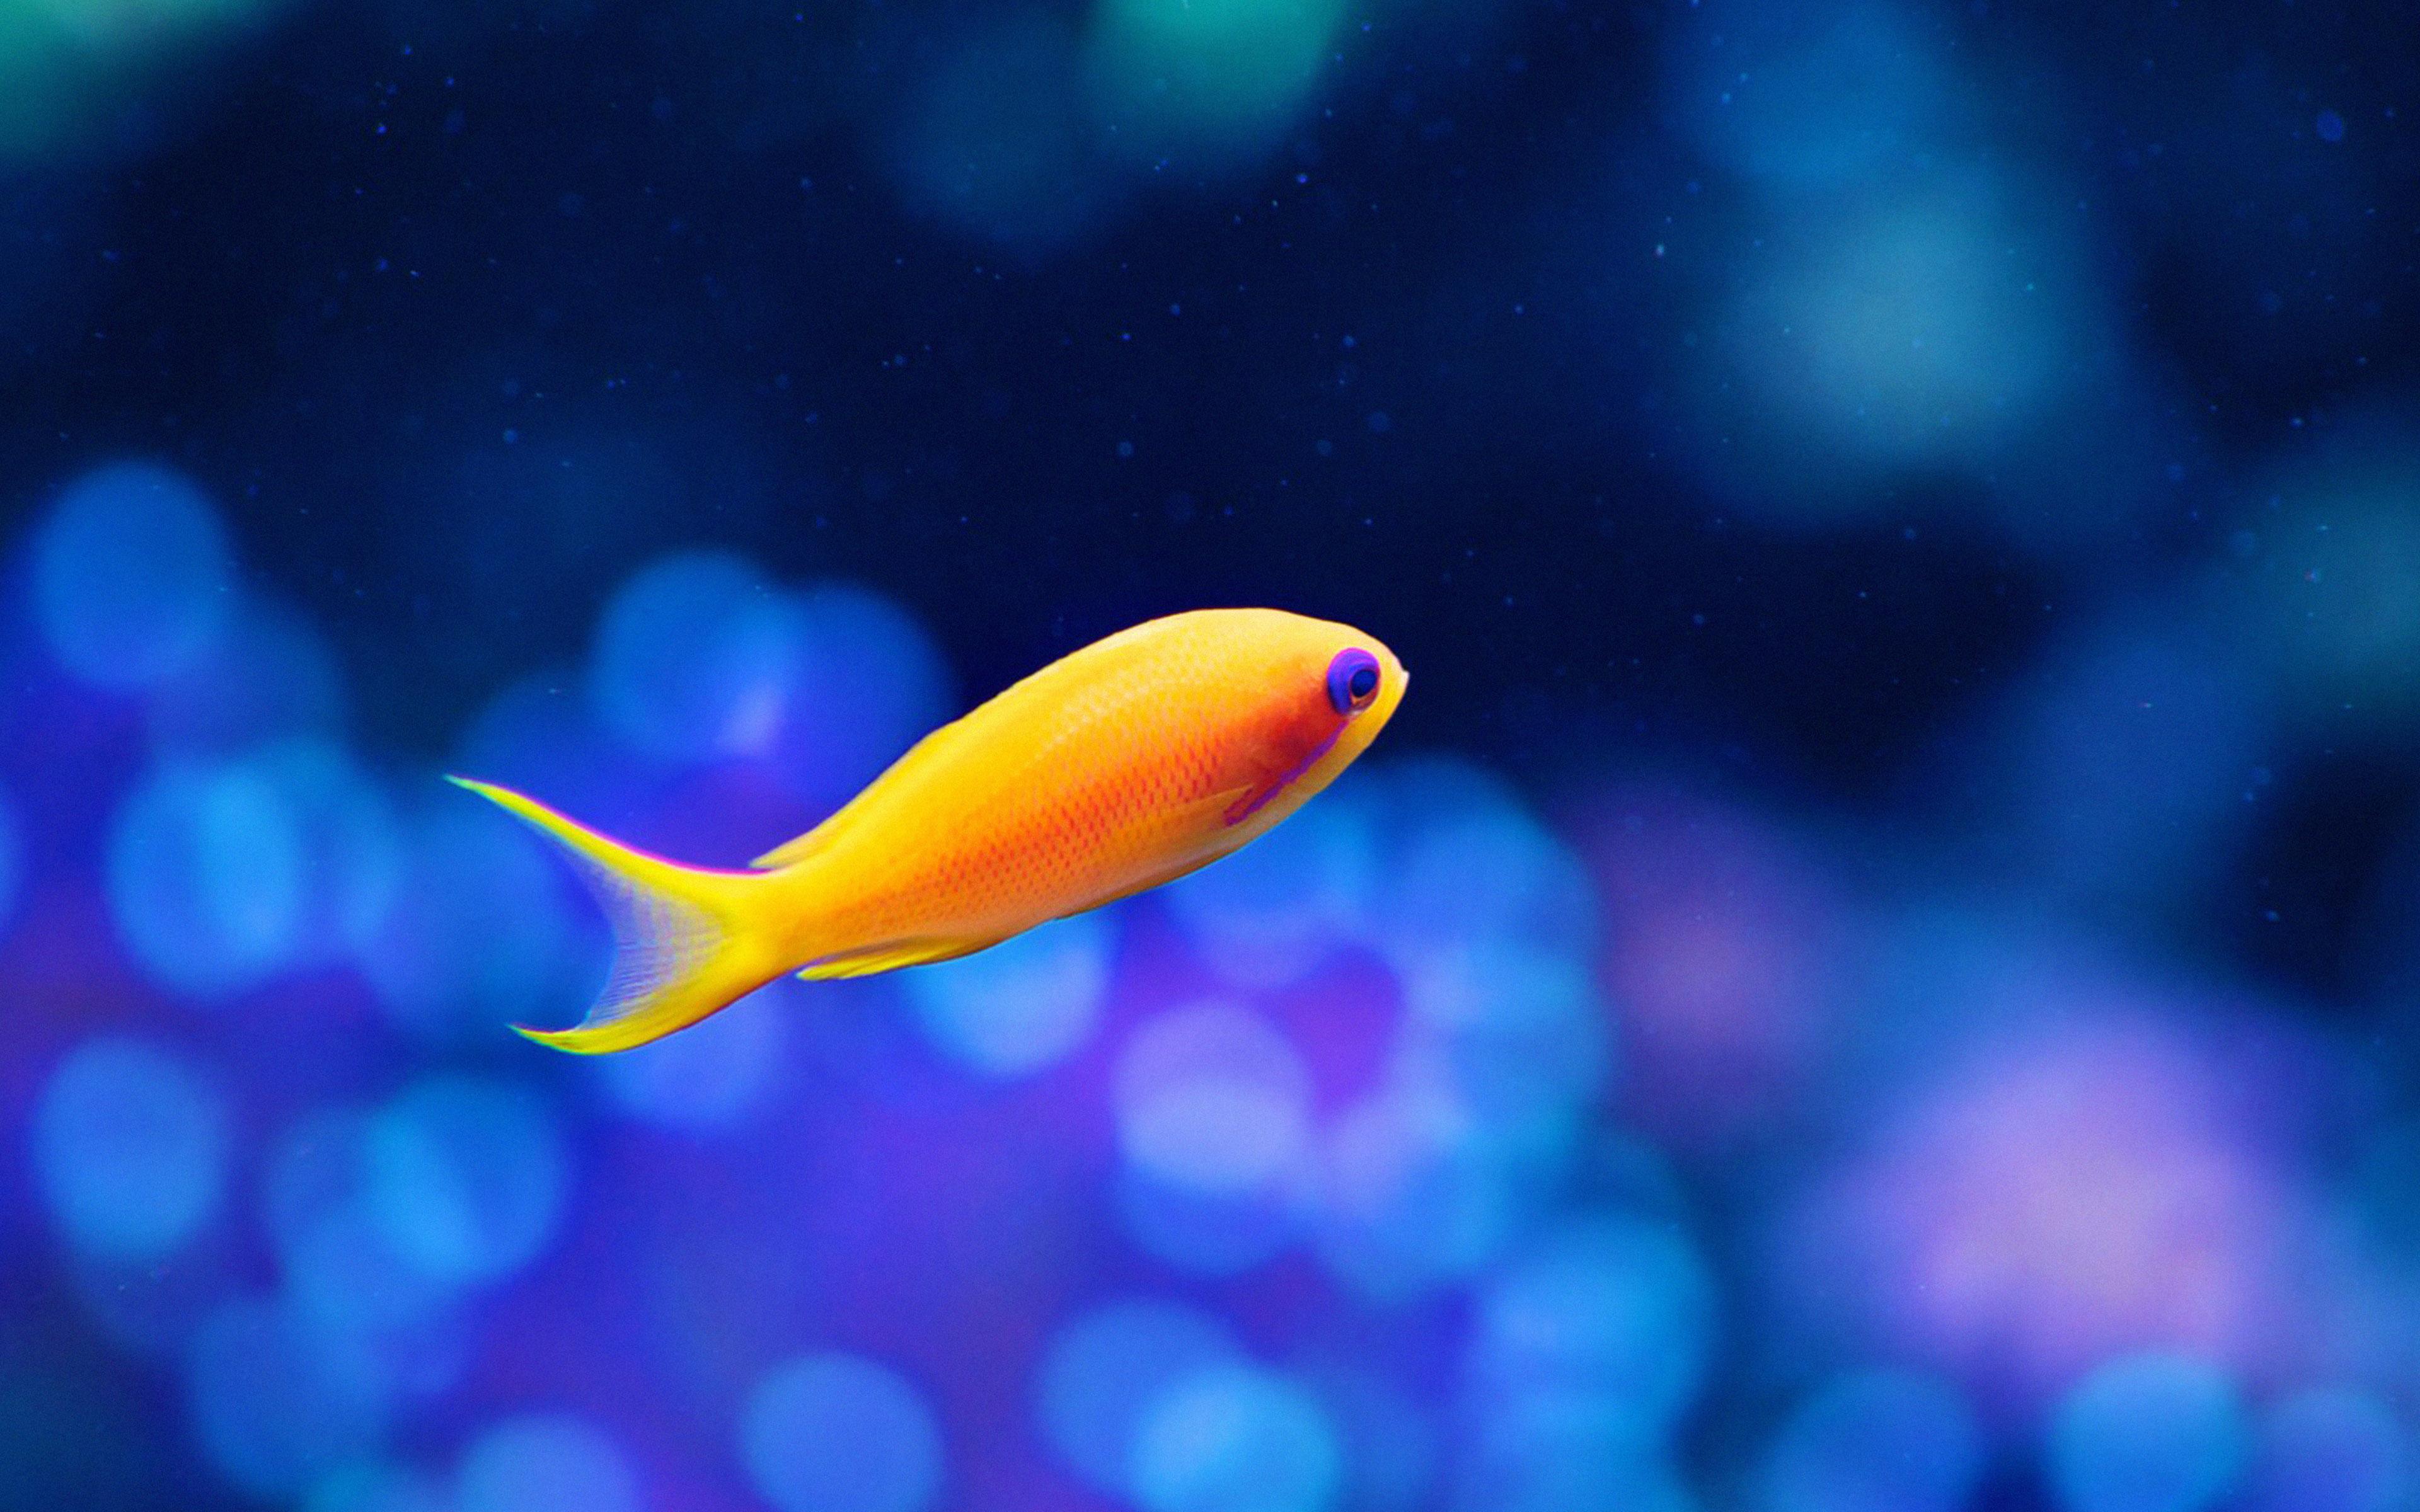 cute fish wallpaper - photo #30